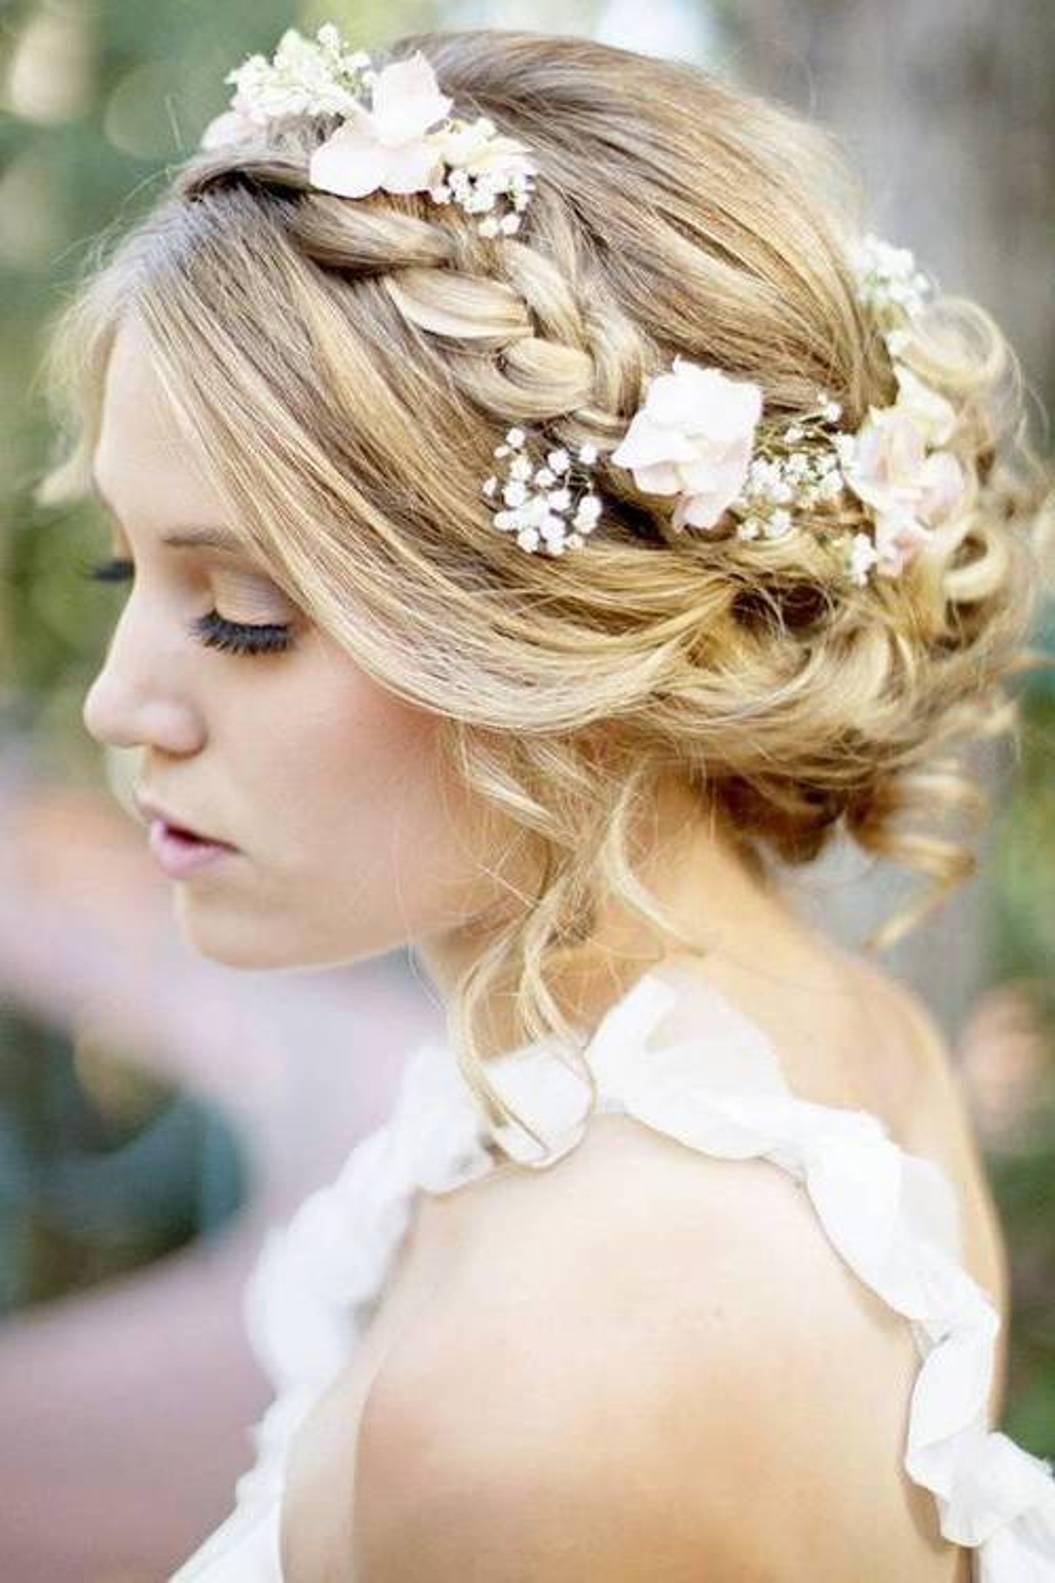 Bride Hairstyles With Veil And Flower. Bride. Get Free Printable ...